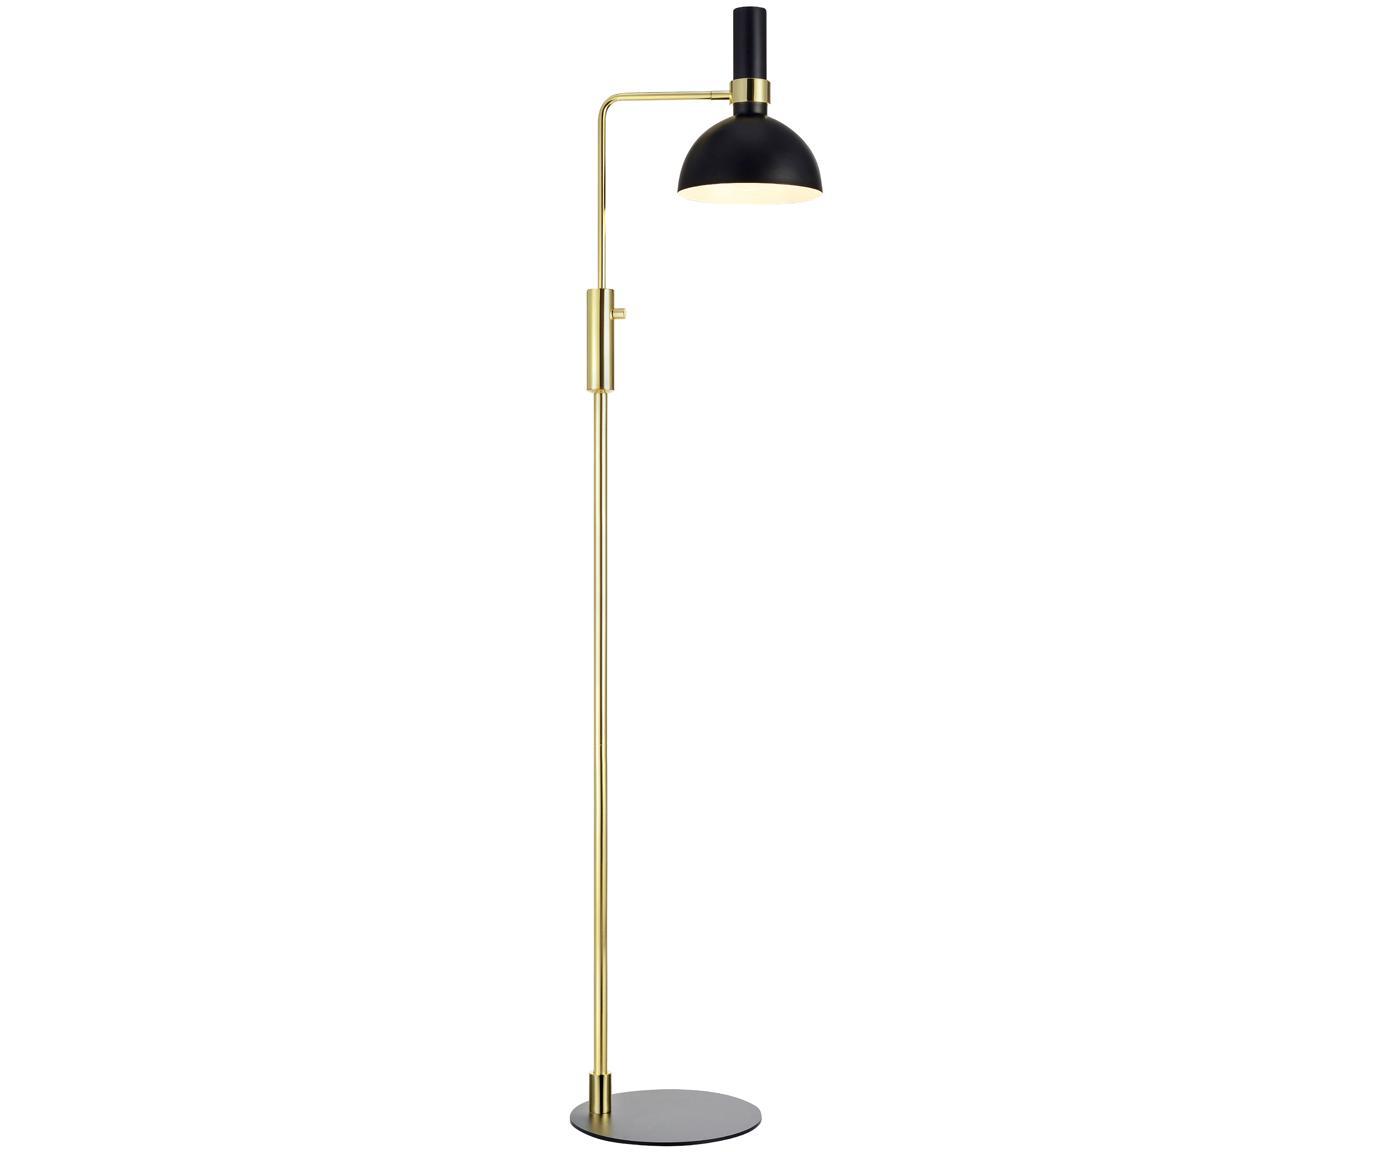 Lampada da terra regolabile Larry, Nero, ottone, Larg. 33 x Alt. 146 cm